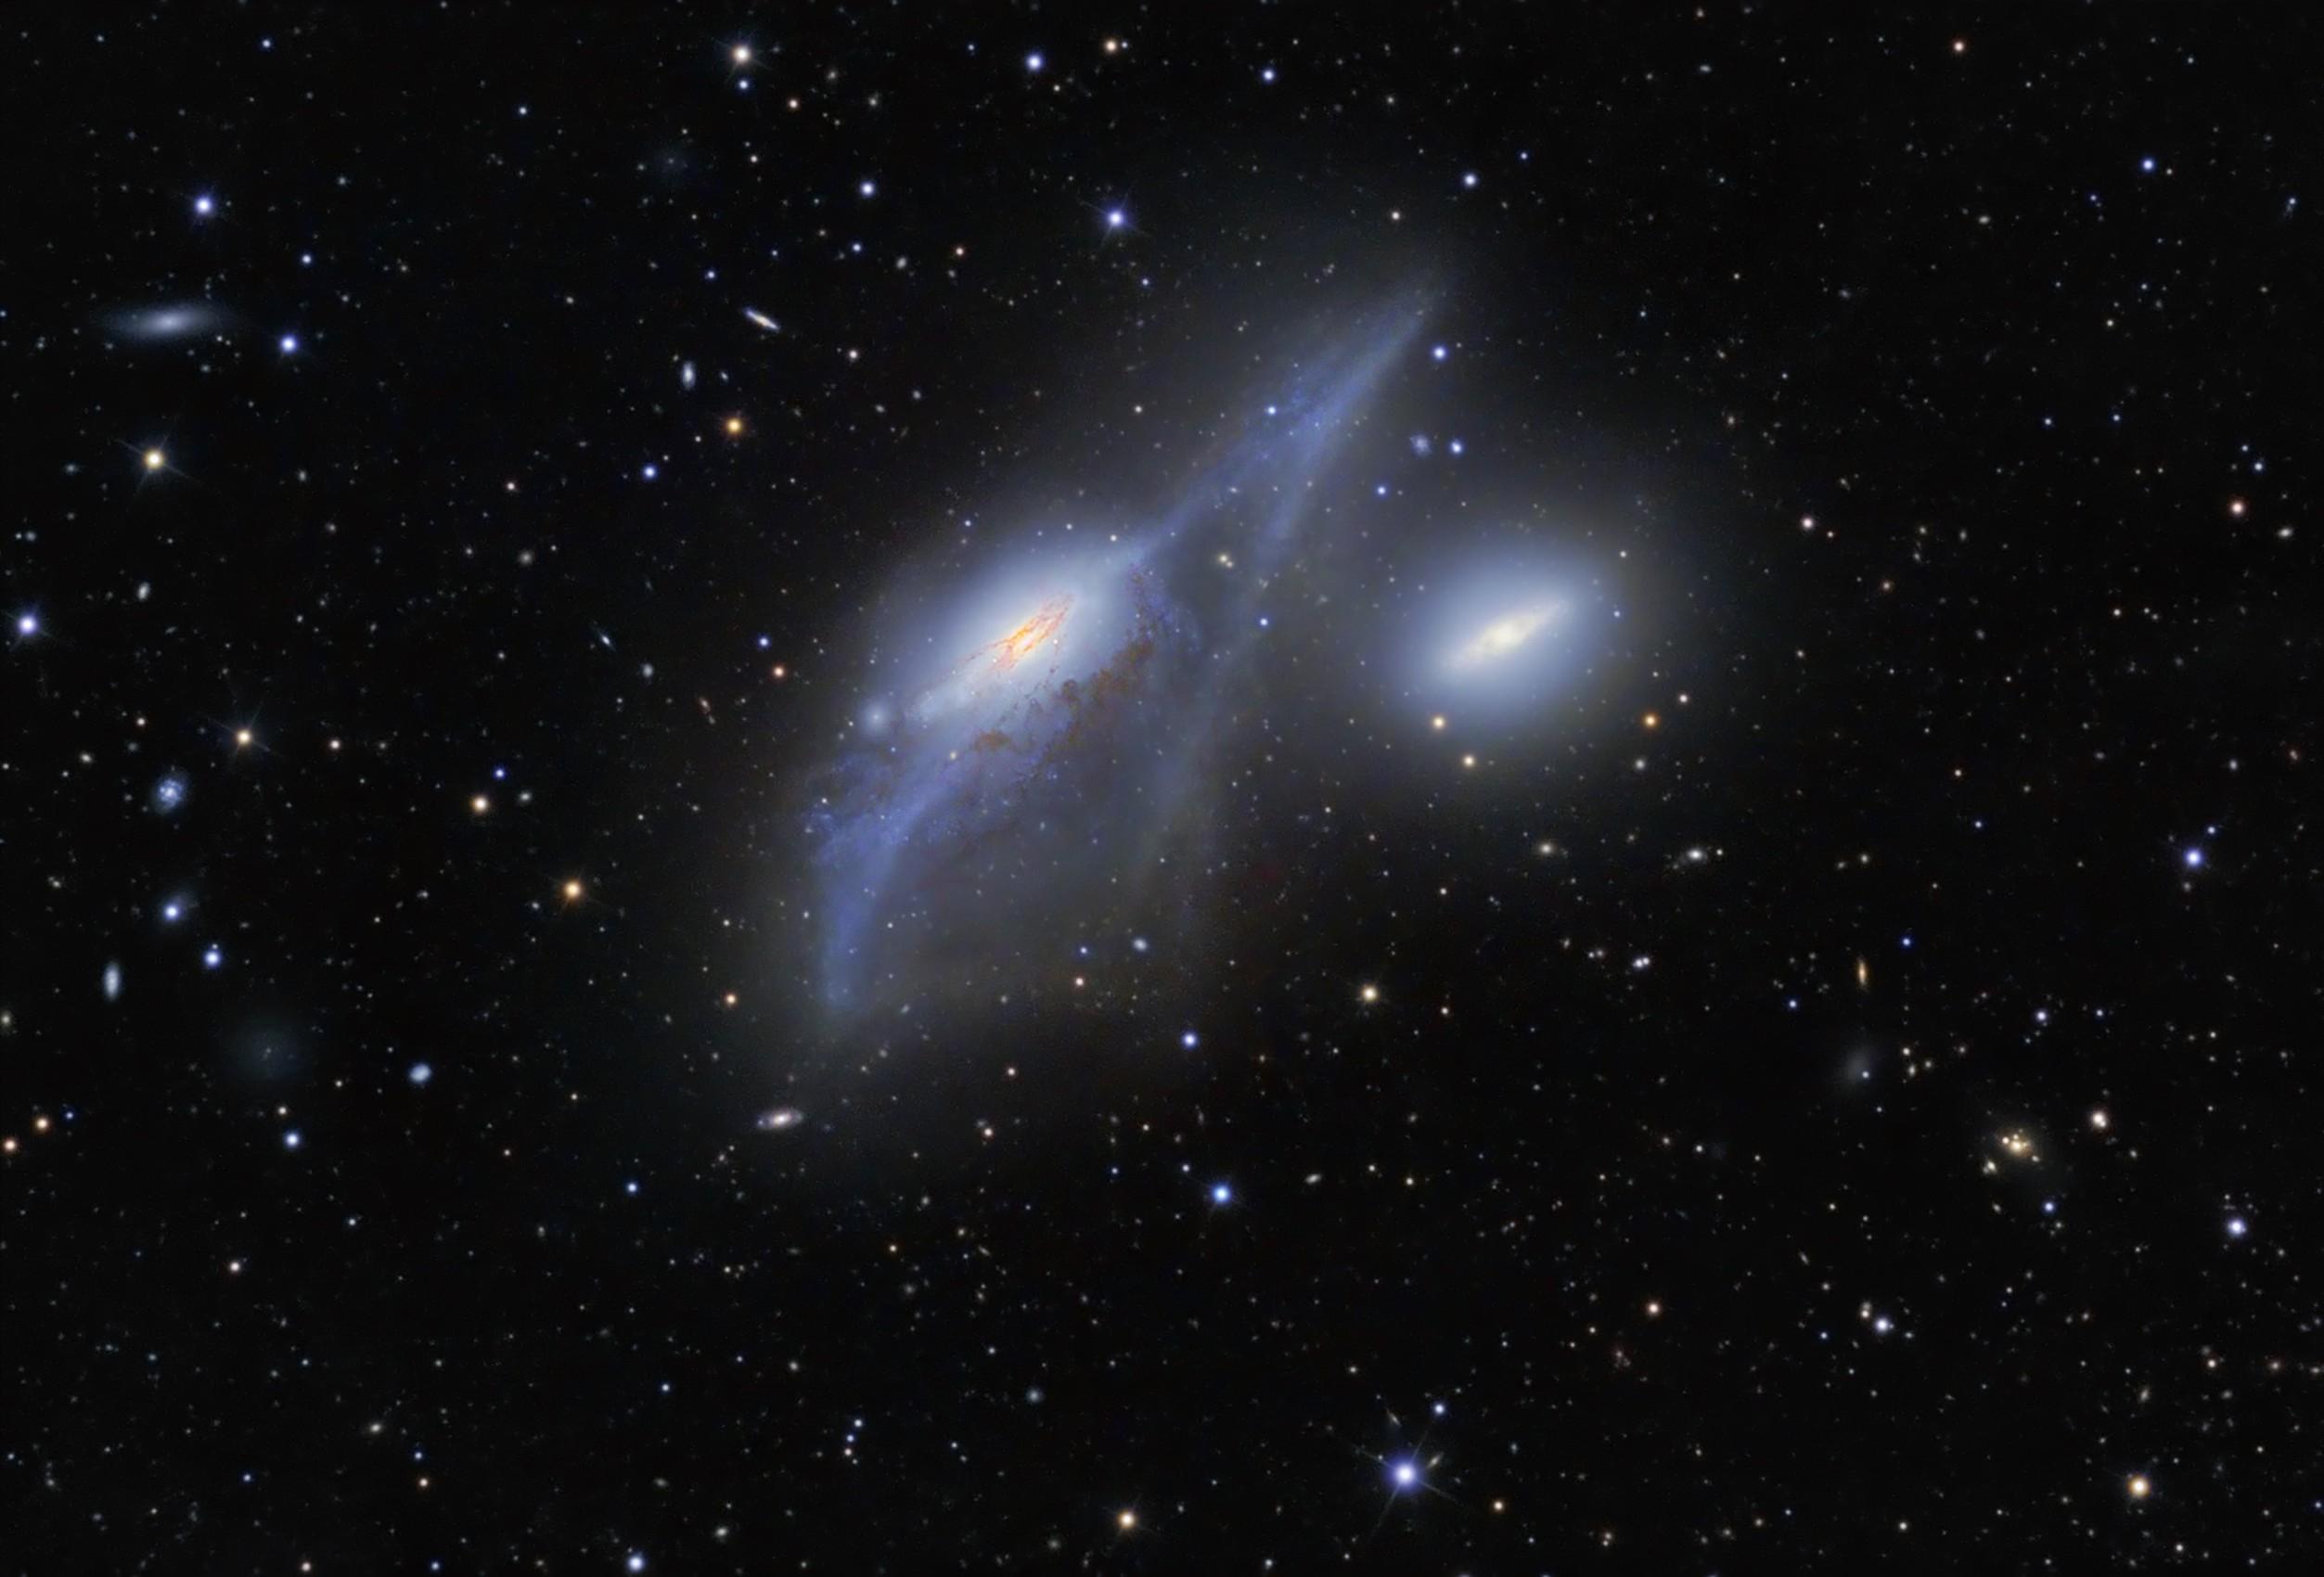 nasa archive astronomy - photo #45